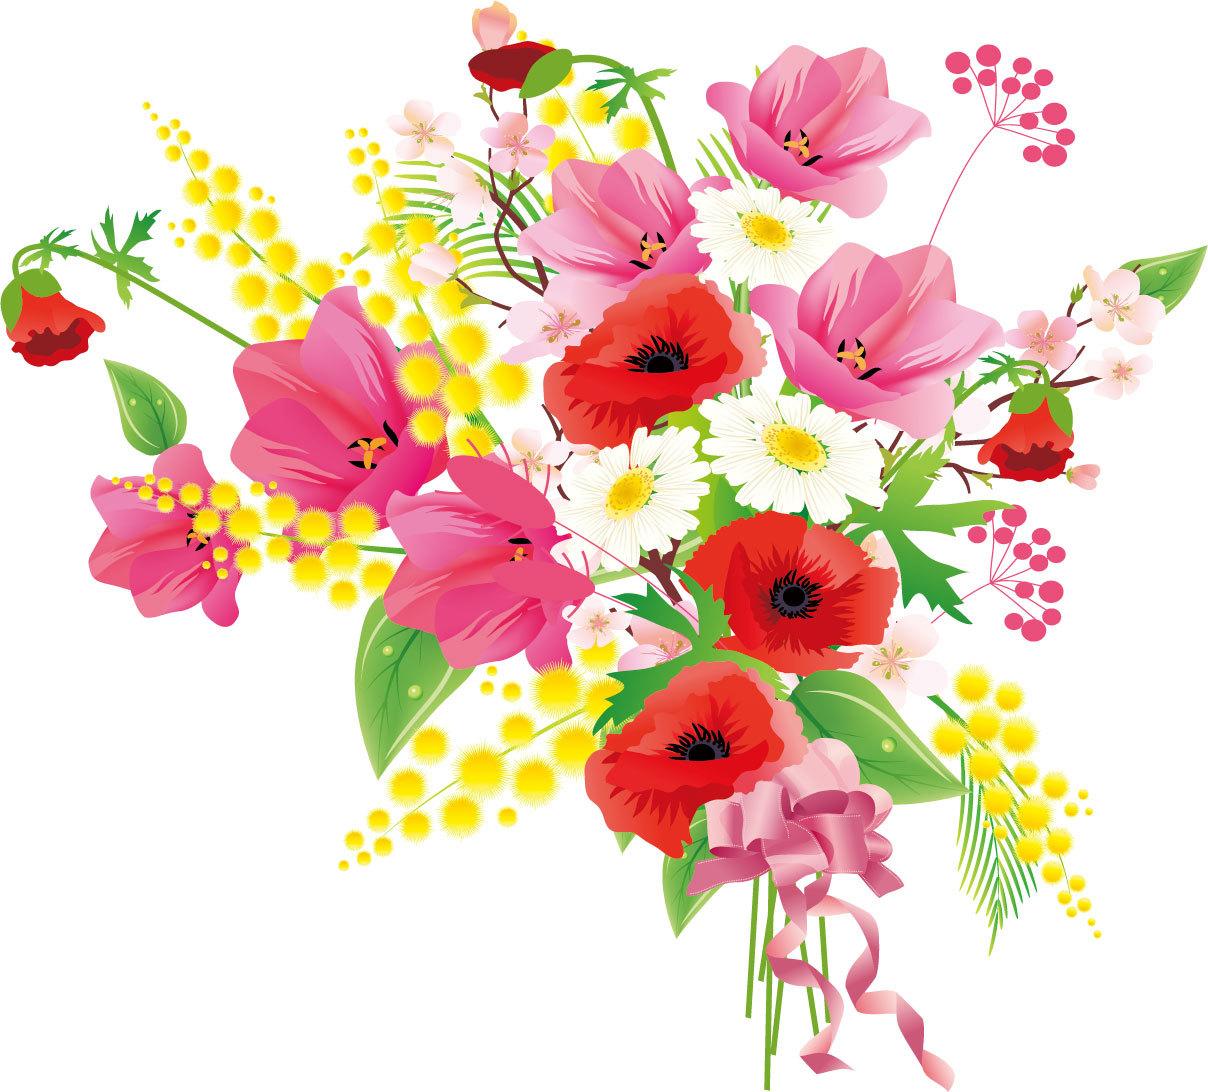 母親の誕生日。_a0398100_16294253.jpg